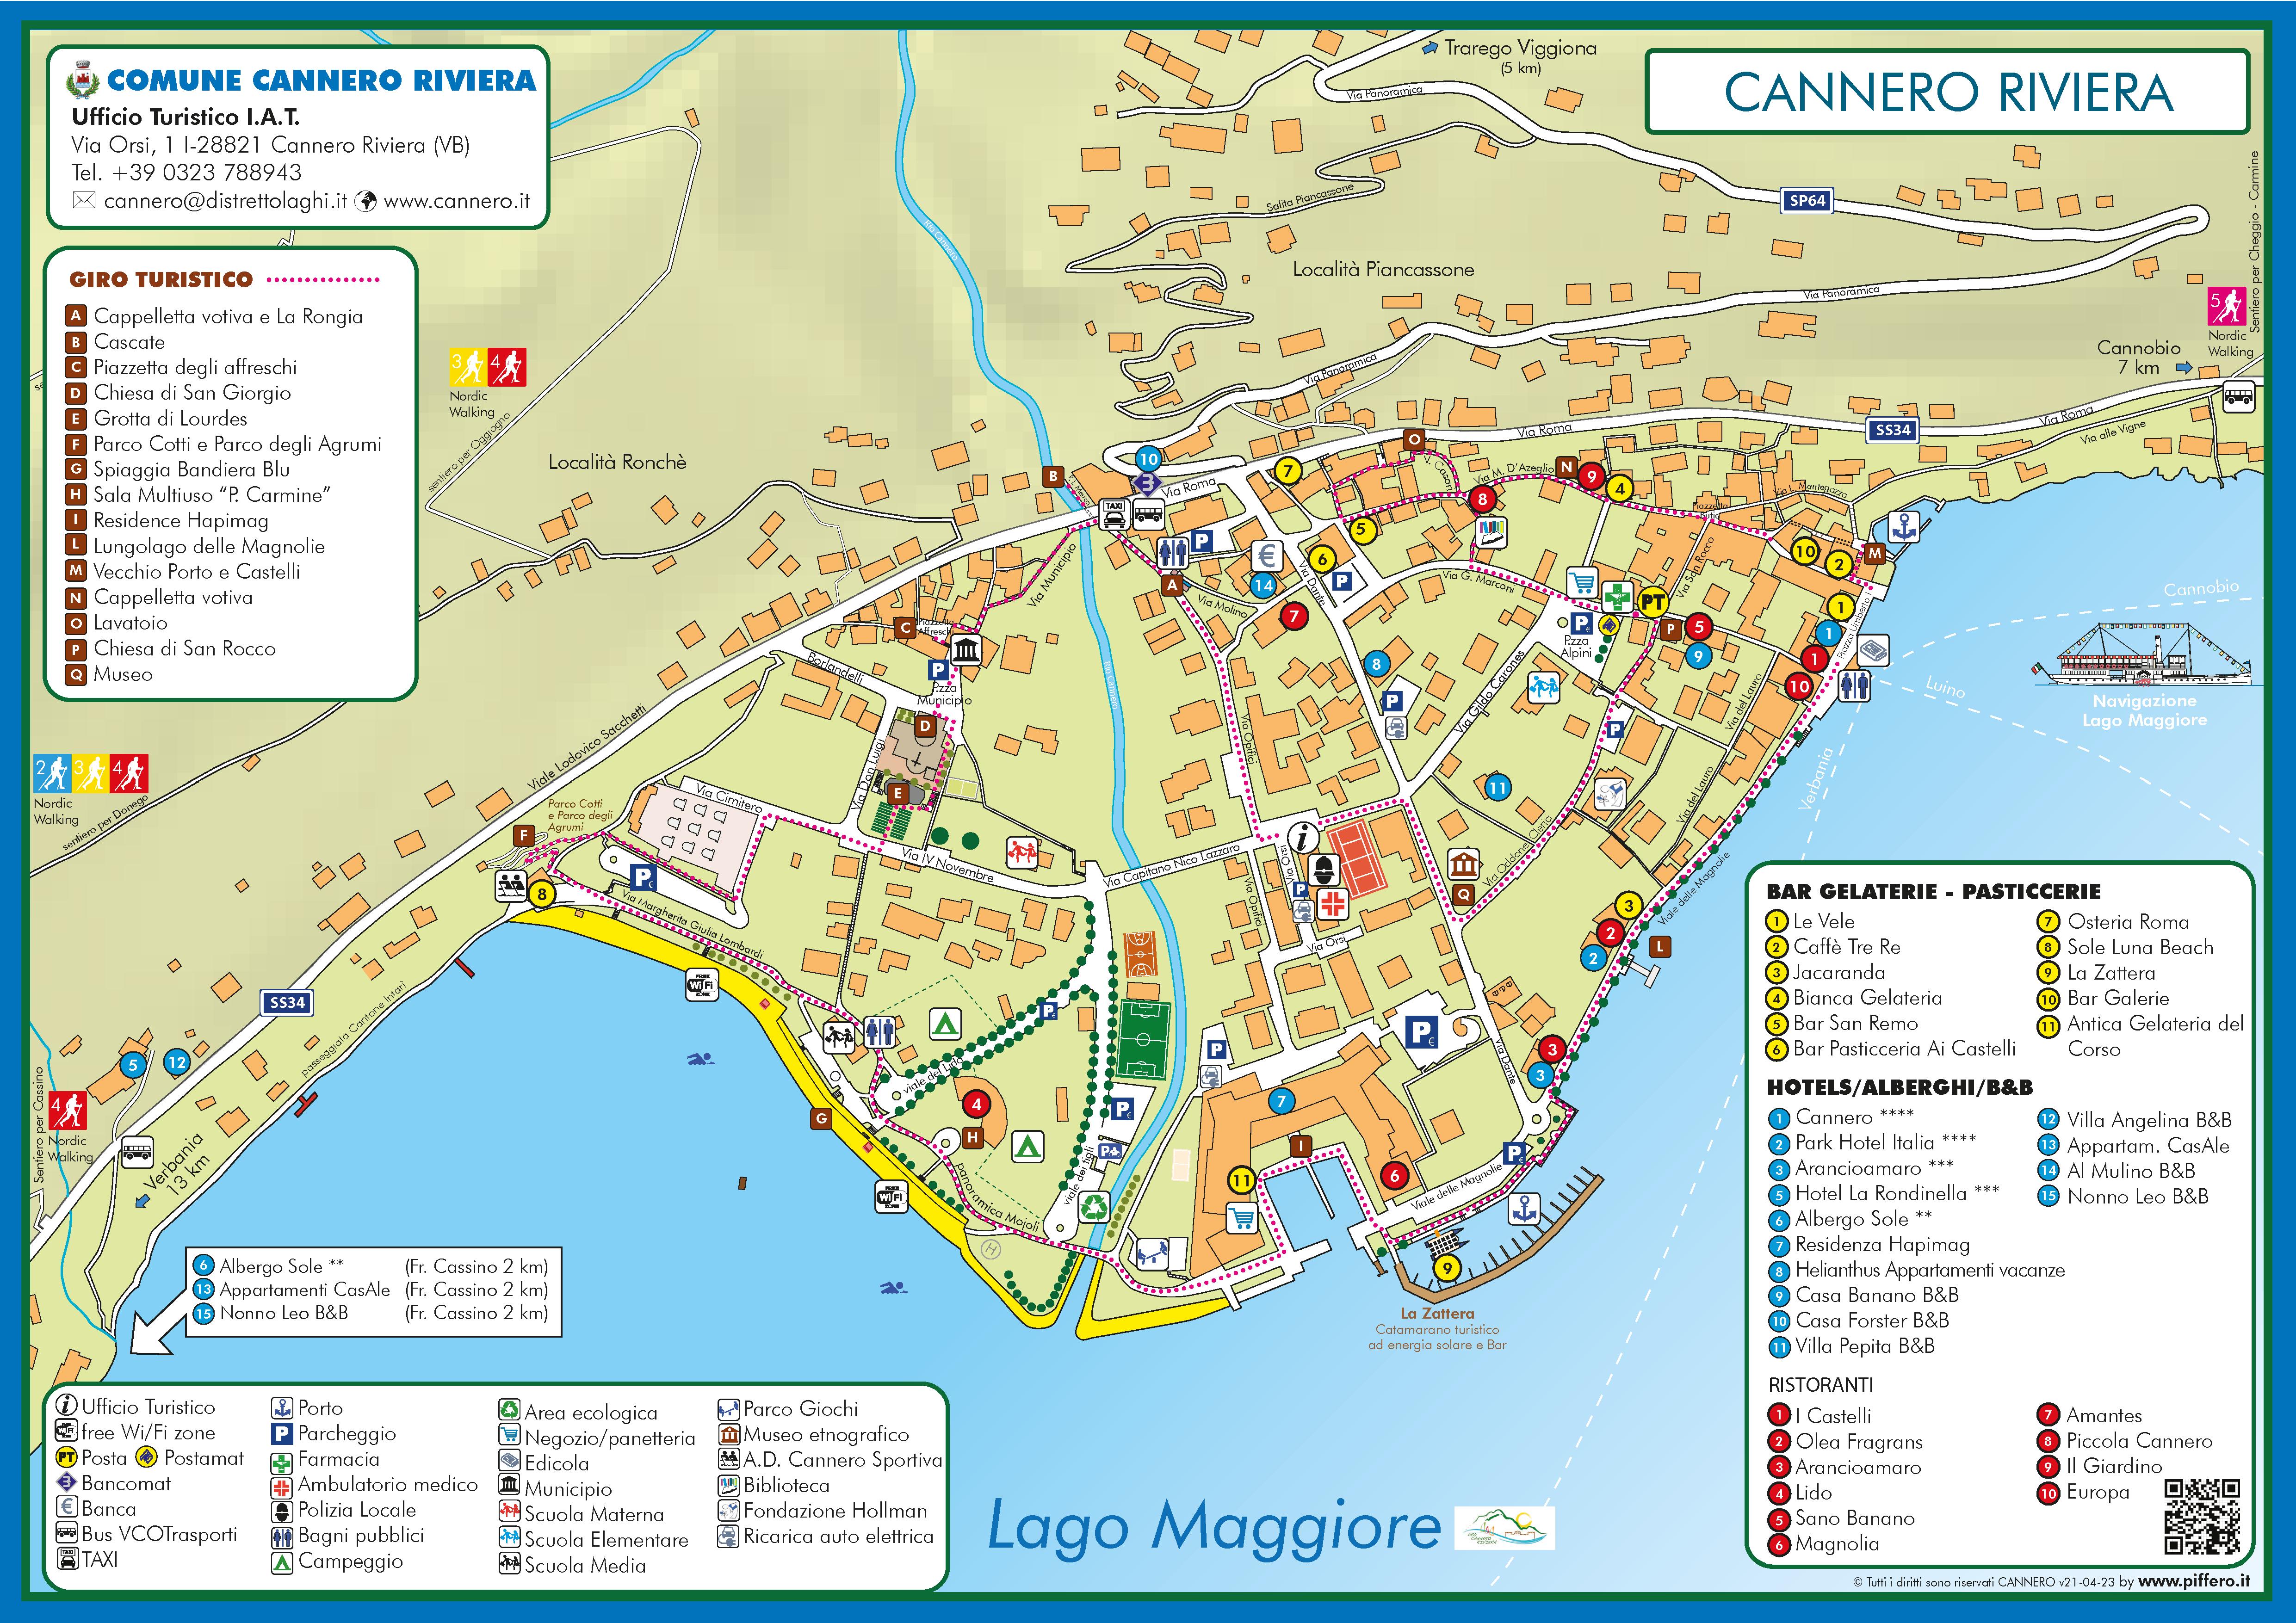 Lageplan Cannero Riviera